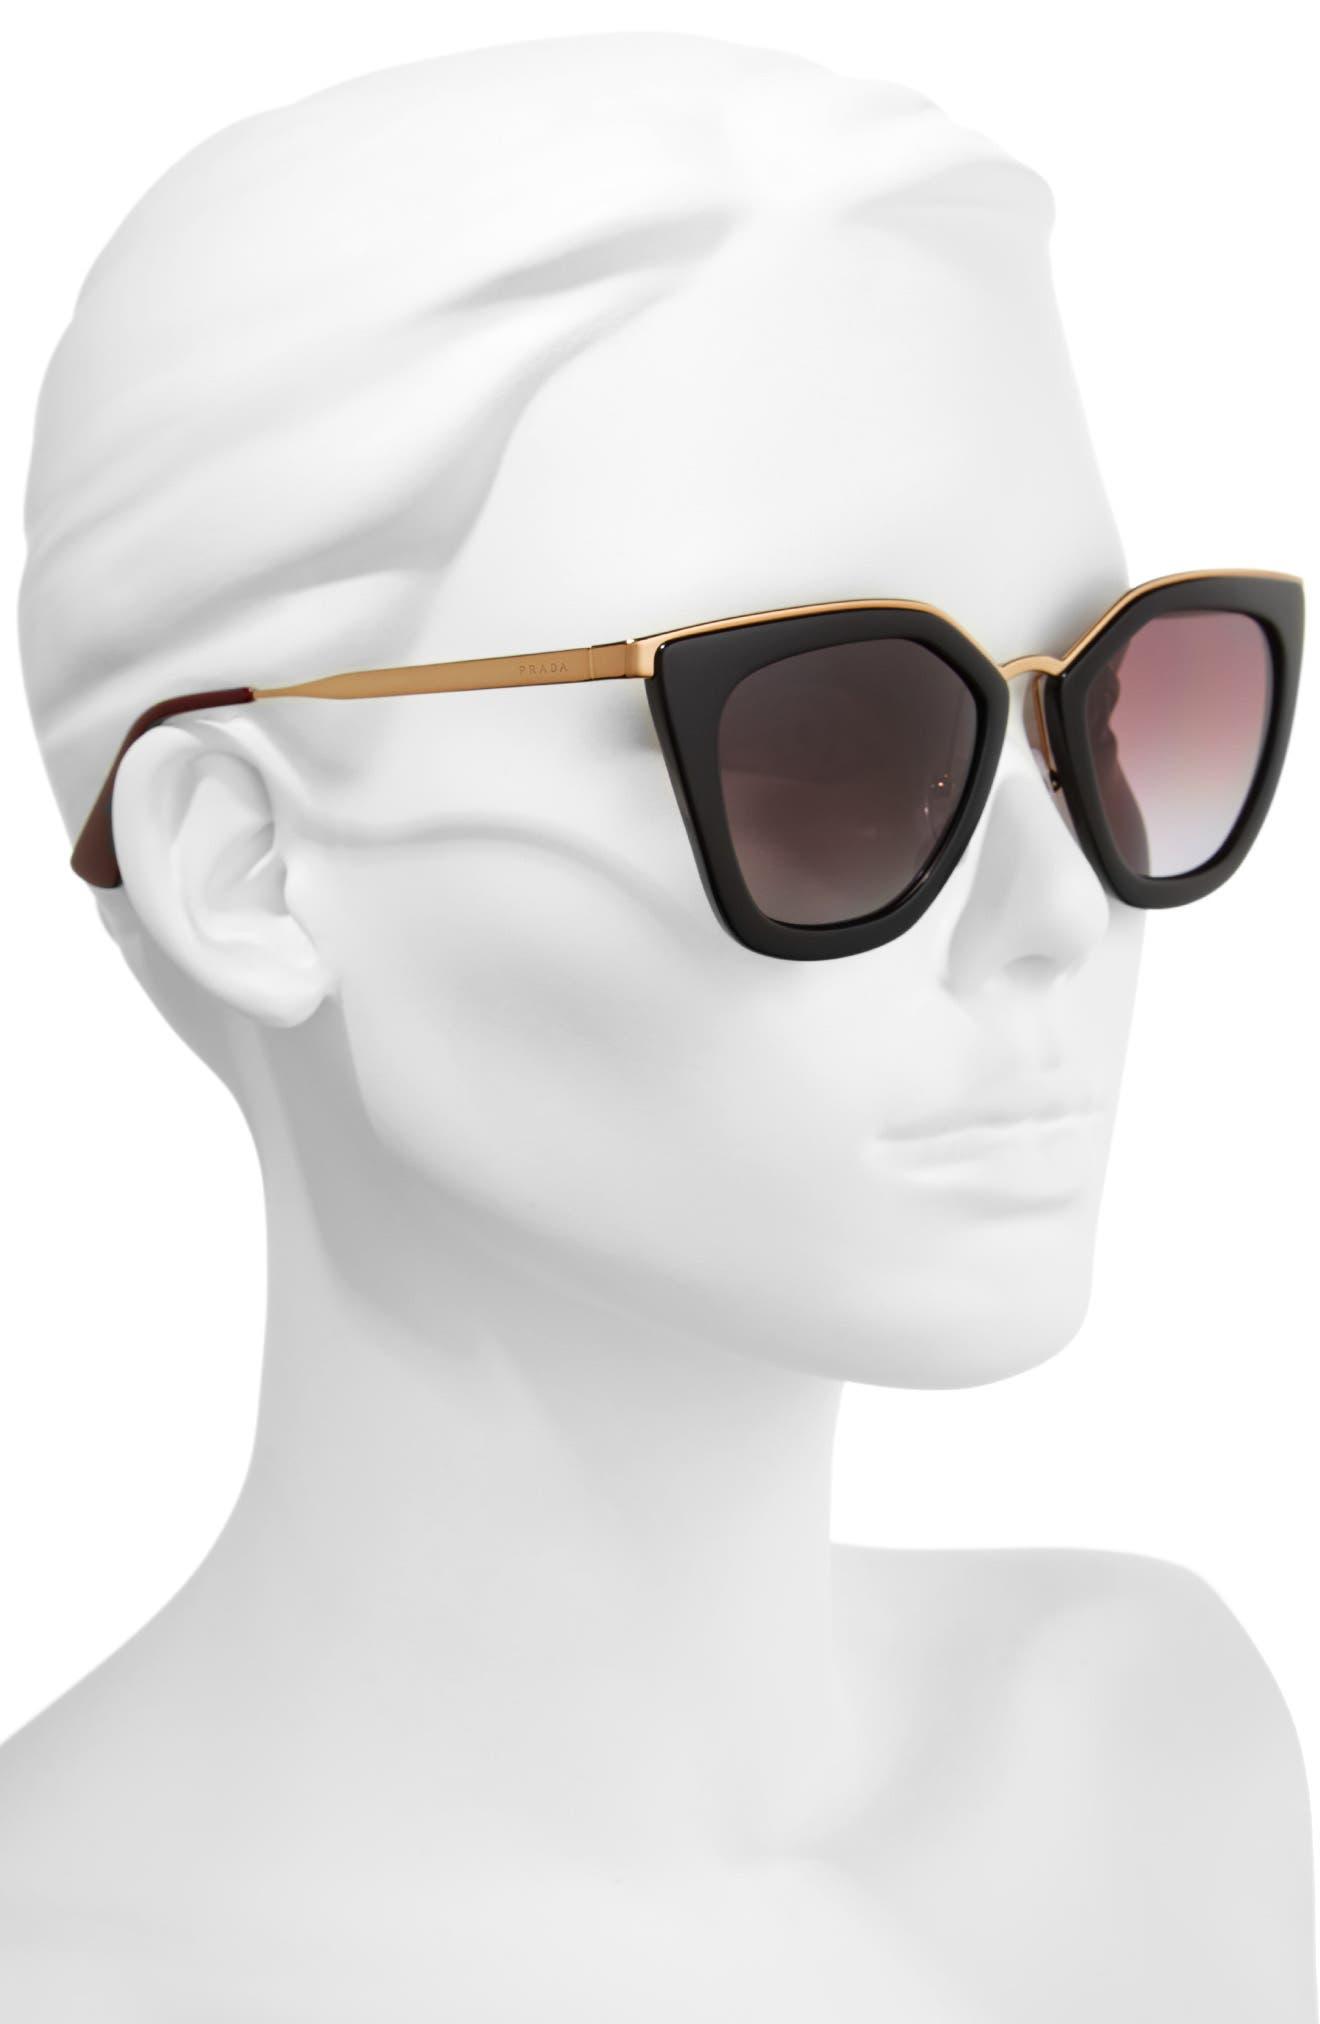 52mm Polarized Cat Eye Sunglasses,                             Alternate thumbnail 2, color,                             001